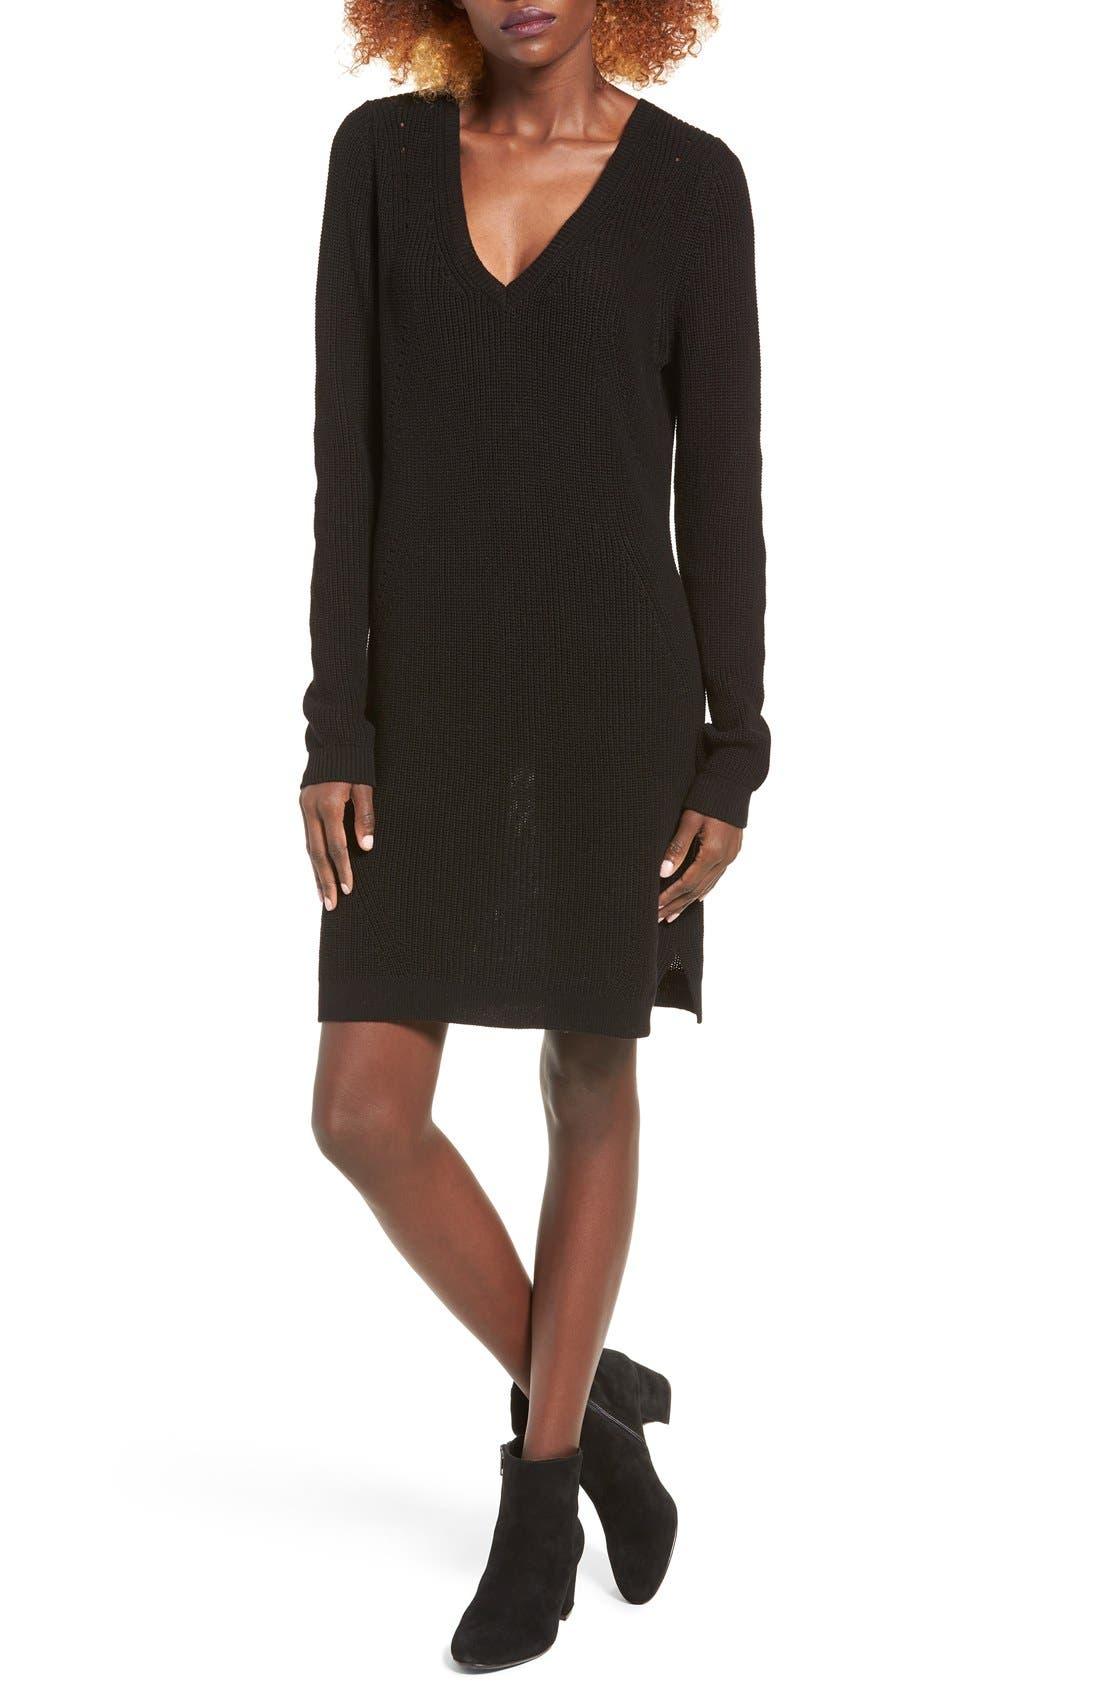 BP., Shaker Stitch Sweater Dress, Main thumbnail 1, color, 001